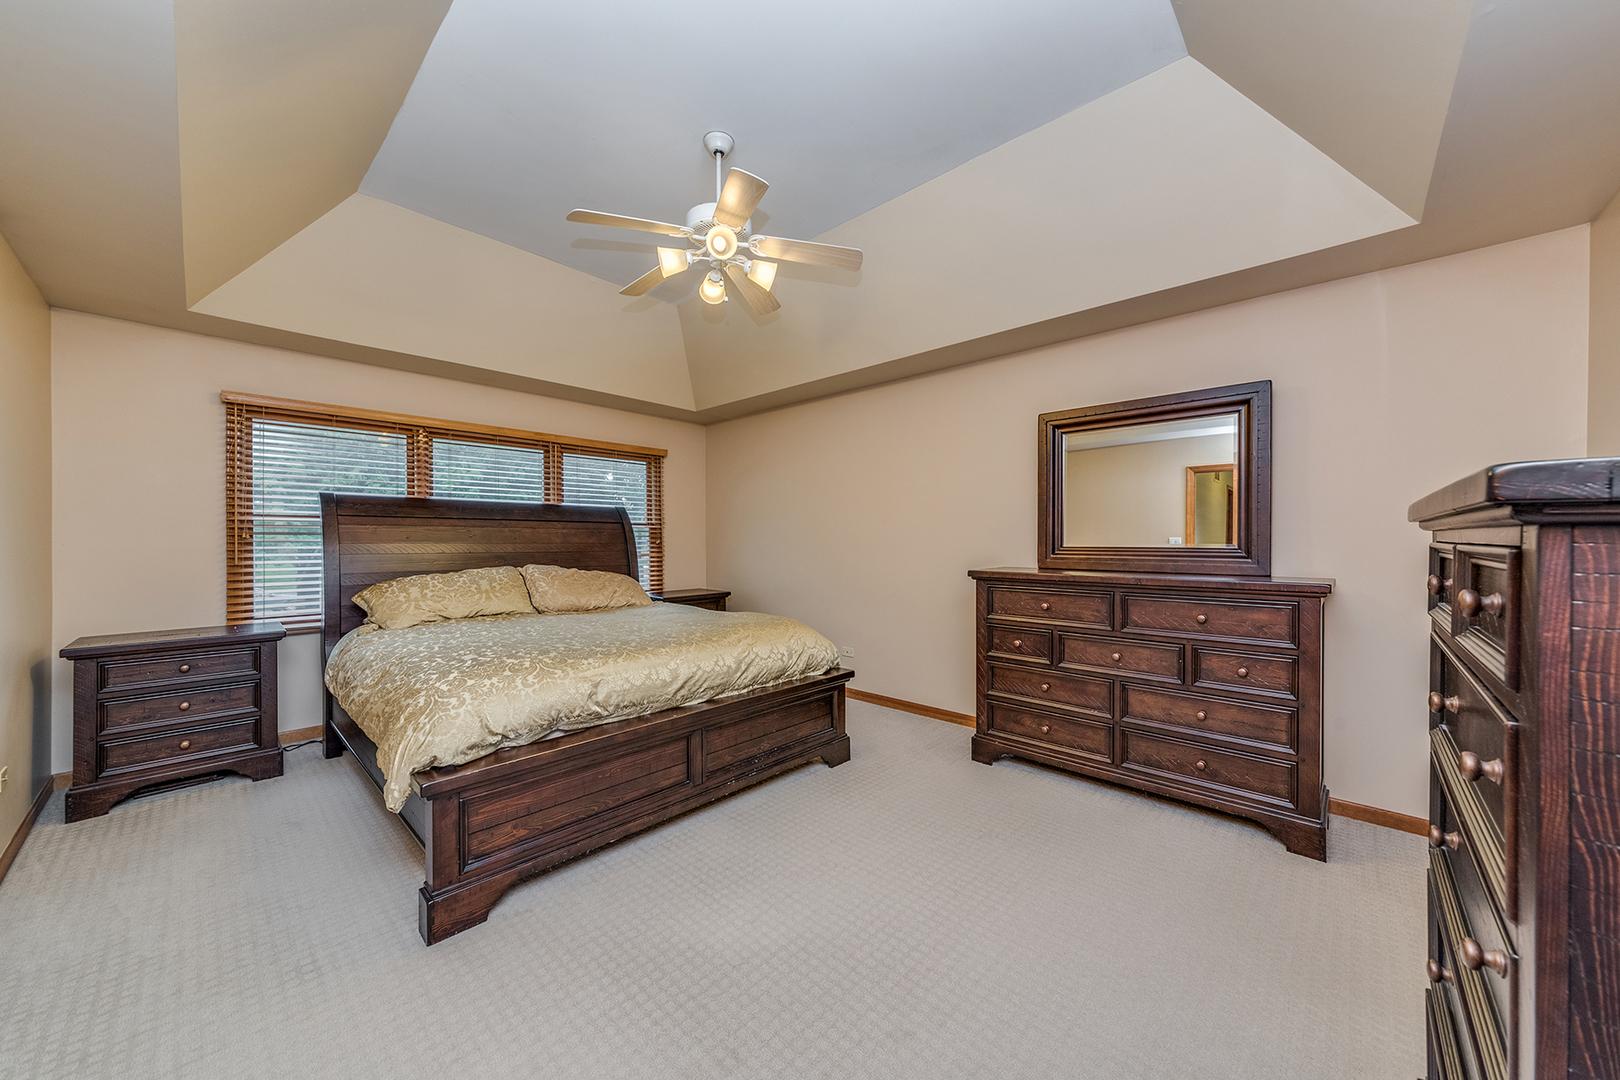 2810 BRECKENRIDGE, AURORA, Illinois, 60504